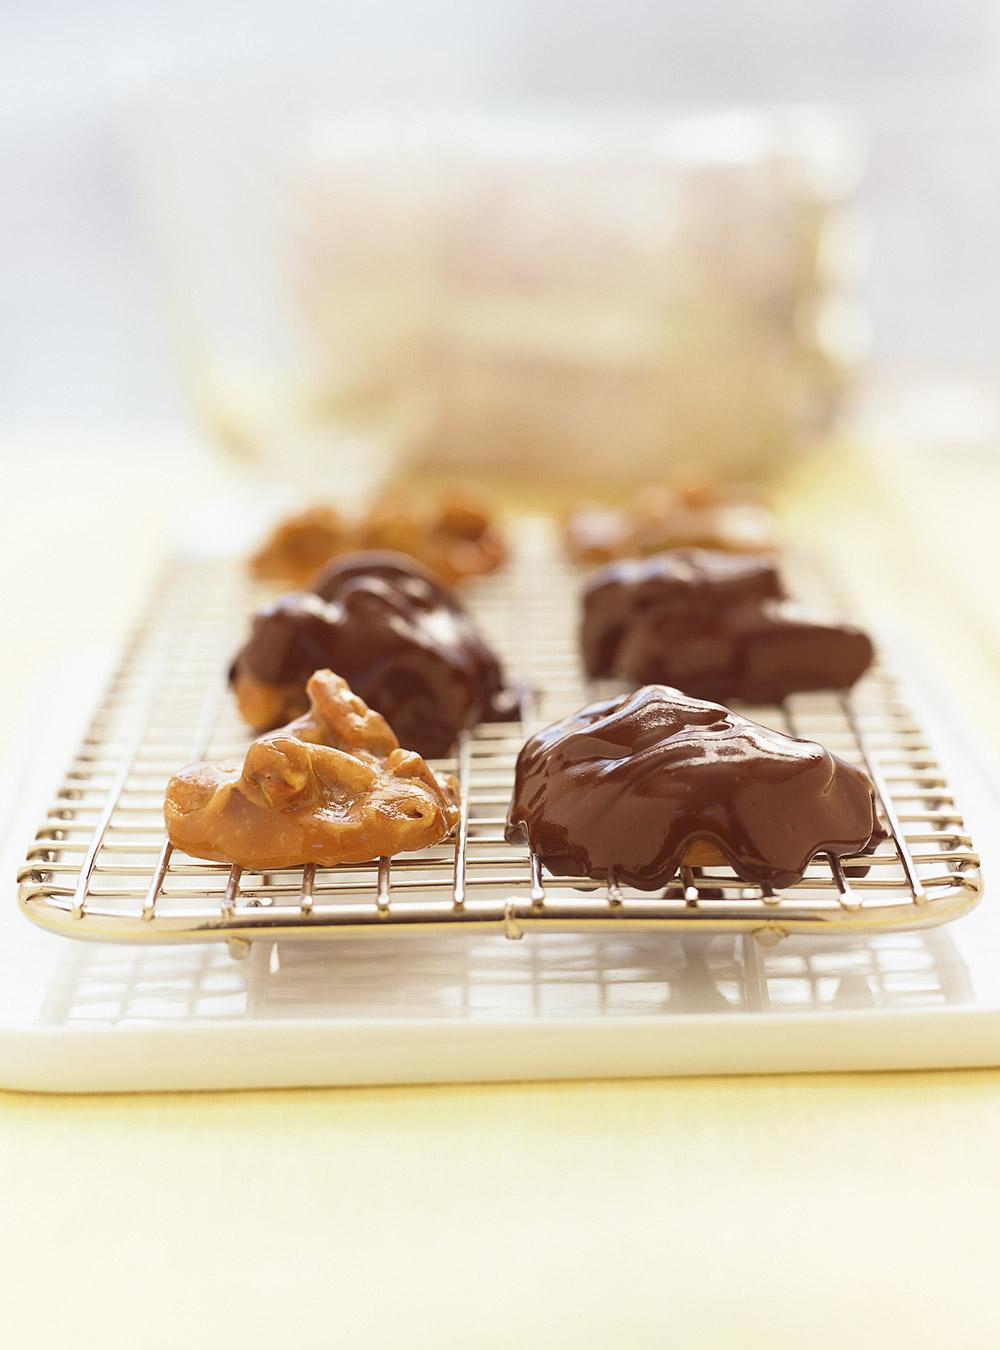 « Tortues » au chocolat (Turtles)